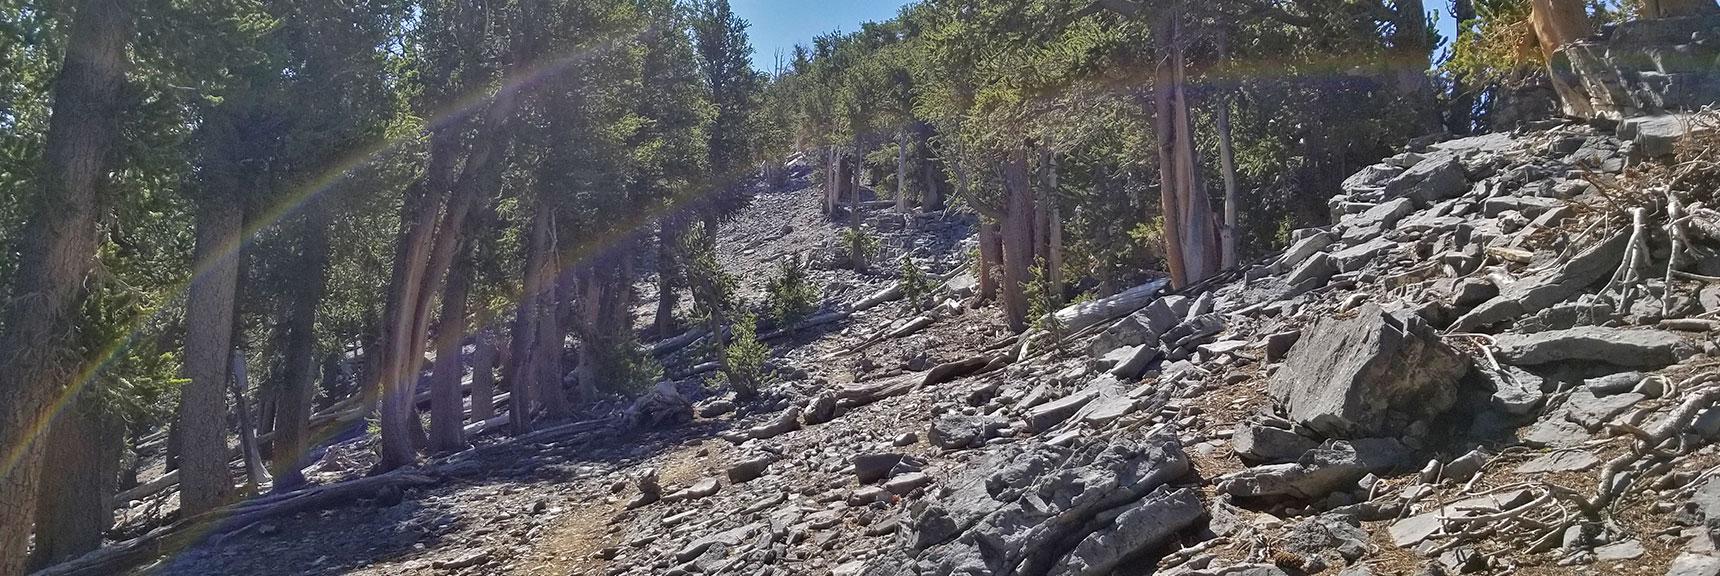 Final Approach Through Bristlecone Pine Forest Beneath Mummy's Toe   Mummy Mountain's Toe, Mt. Charleston Wilderness, Nevada